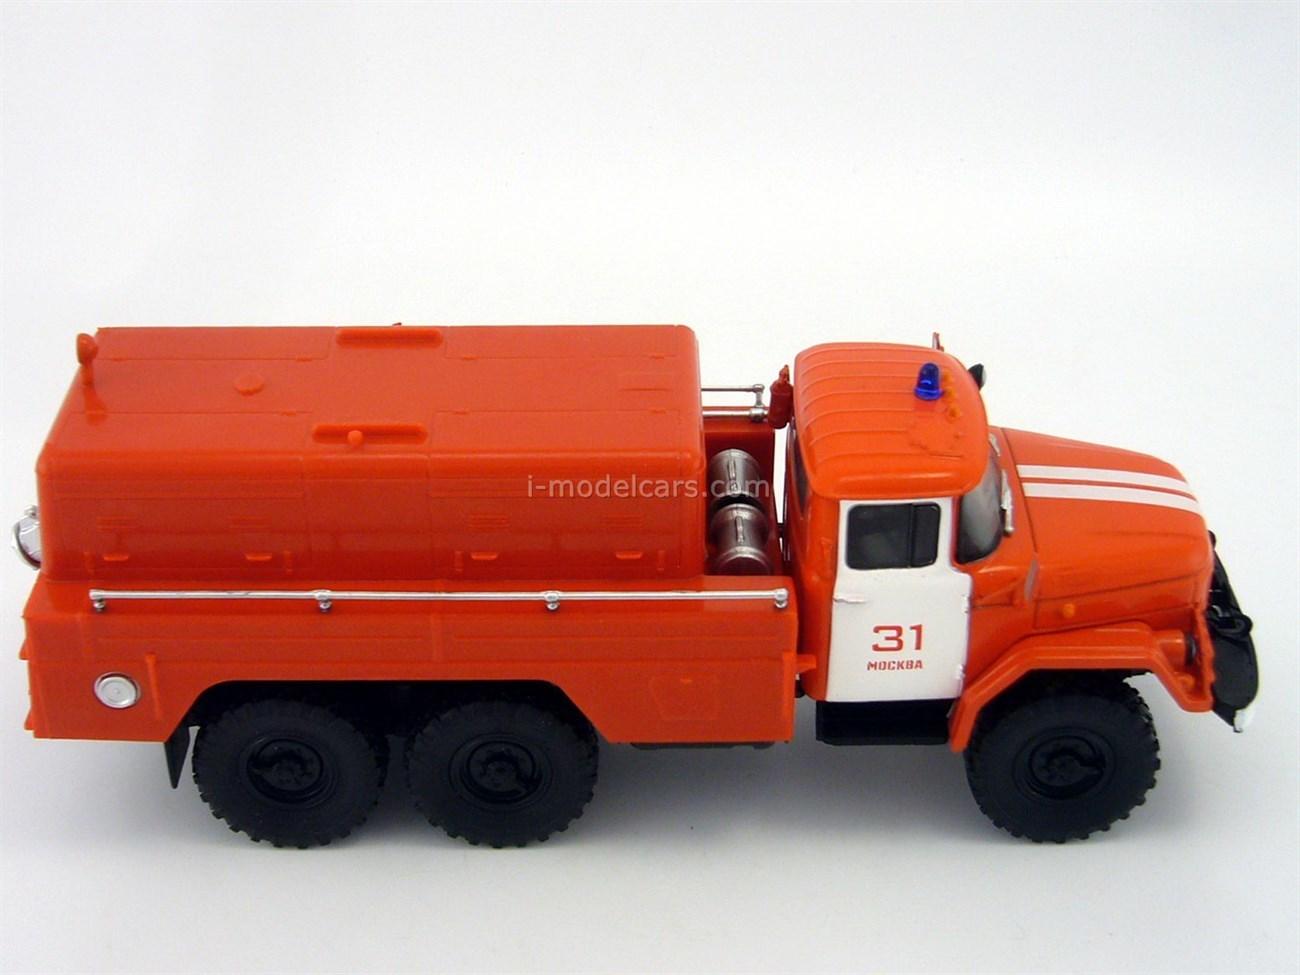 ZIL-131 PNS-110 firefighter 1:43 DeAgostini Auto Legends USSR Trucks #11